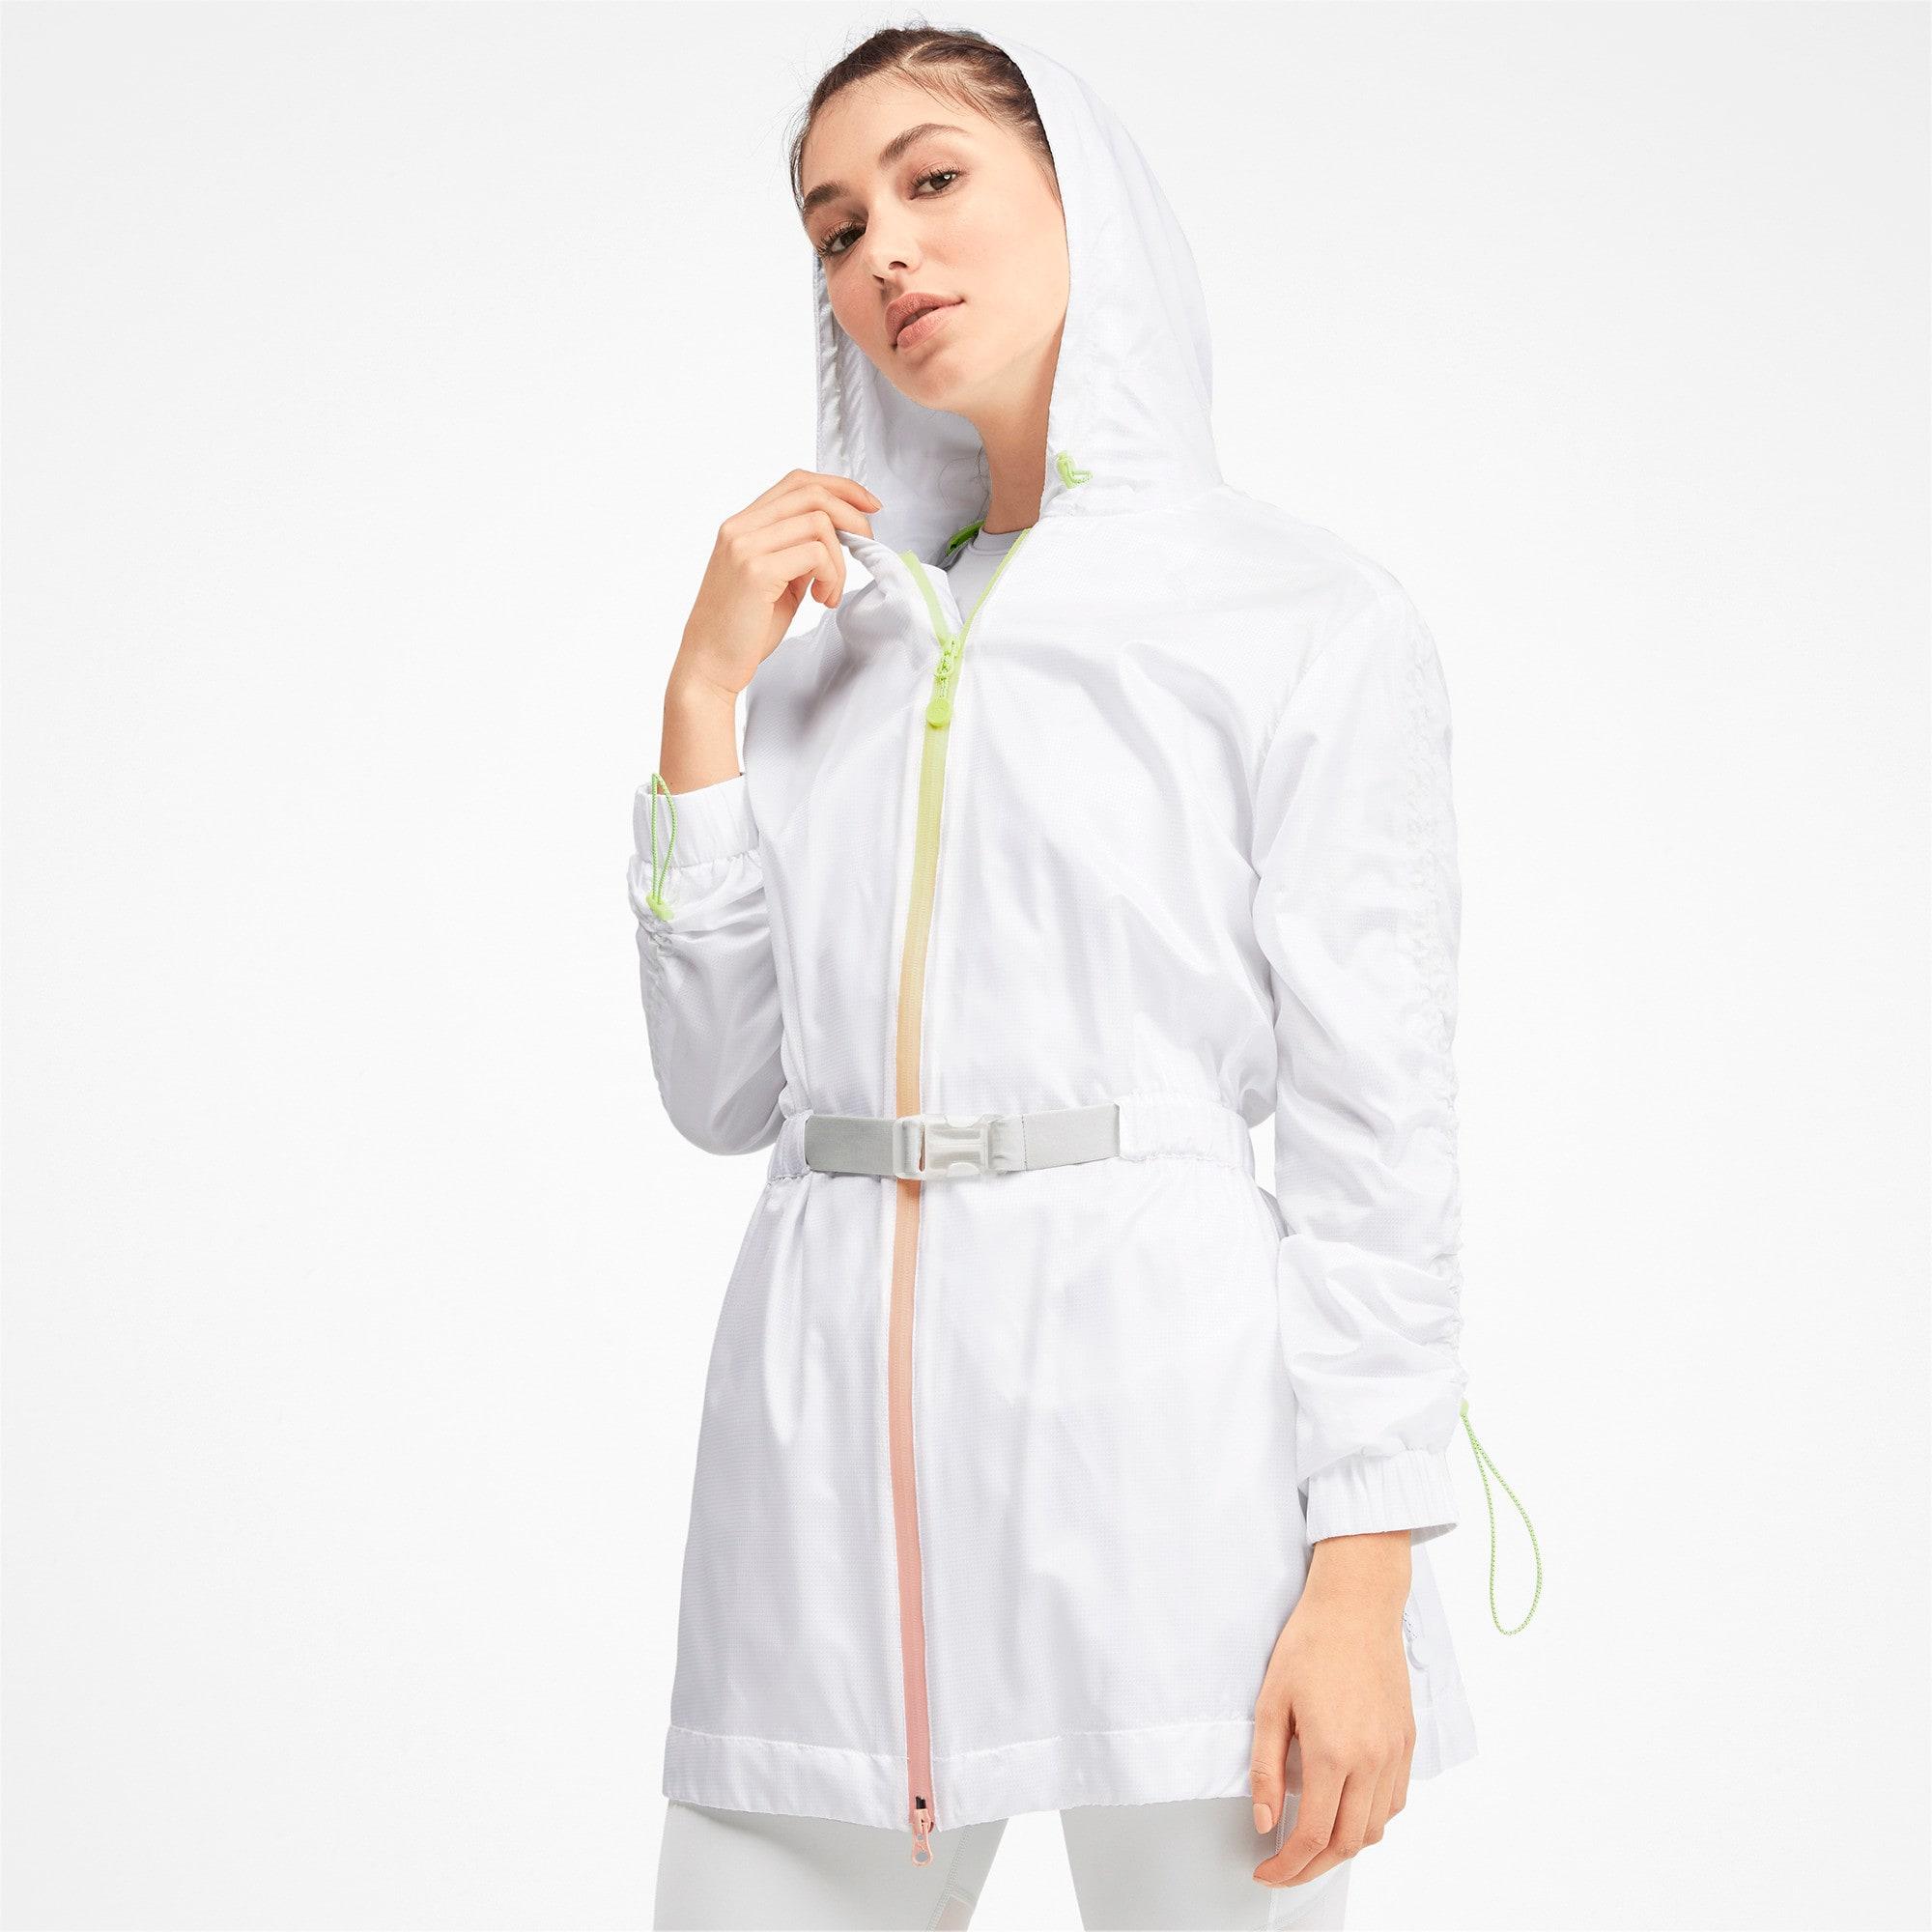 Thumbnail 1 of PUMA x SELENA GOMEZ Hooded Women's Jacket, Puma White, medium